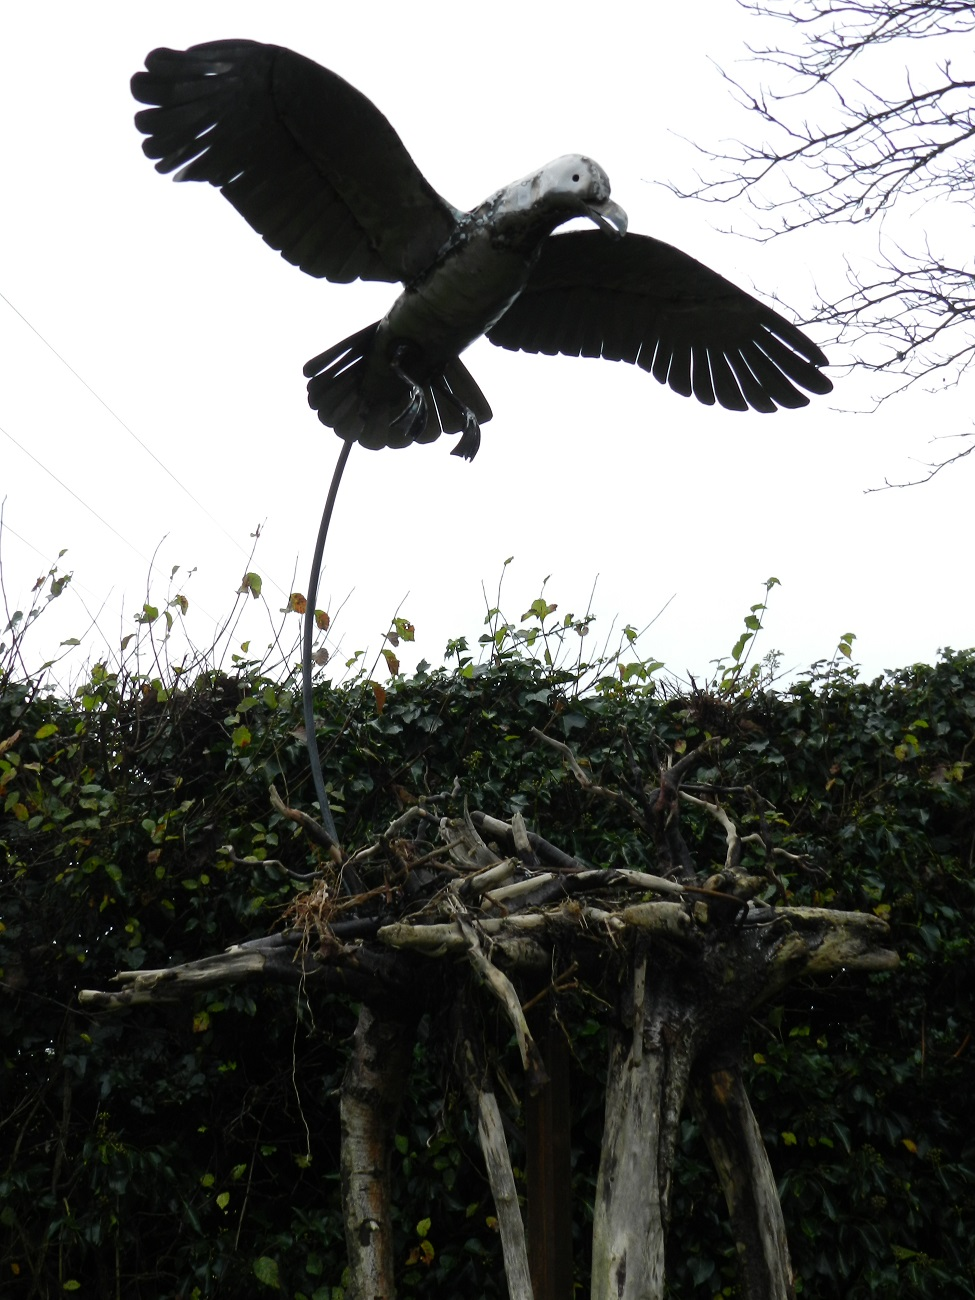 Seagulls Nesting